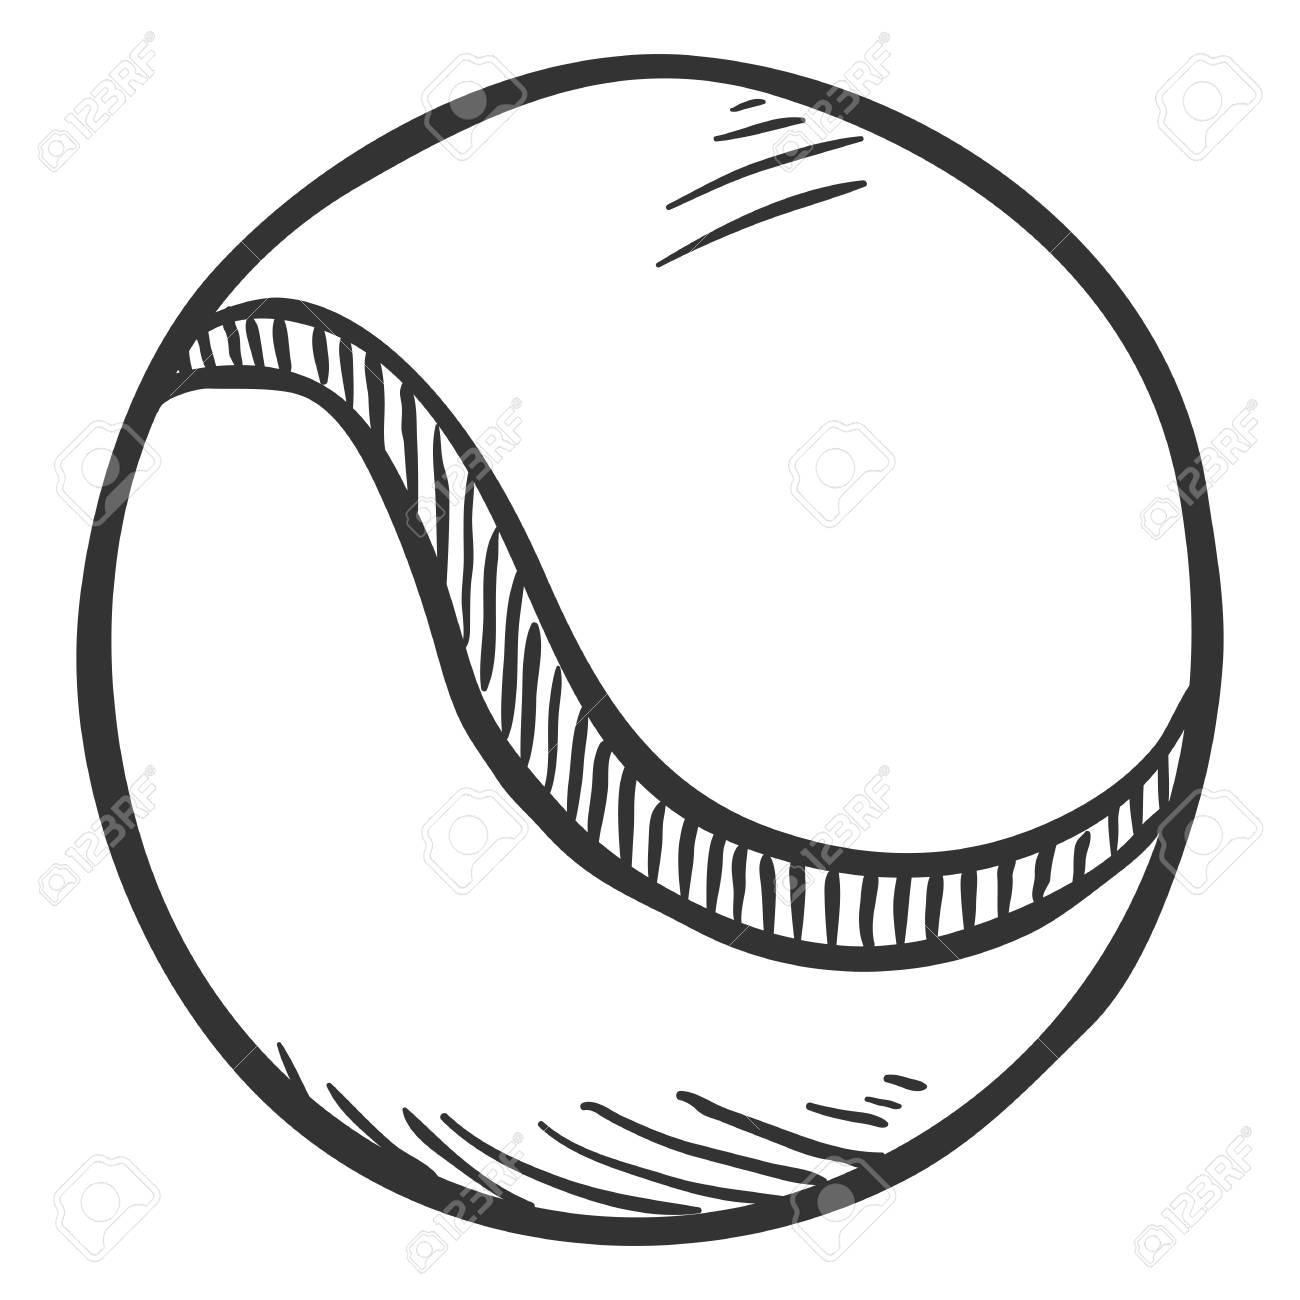 vector pencil sketch tennis ball on white background royalty free rh 123rf com